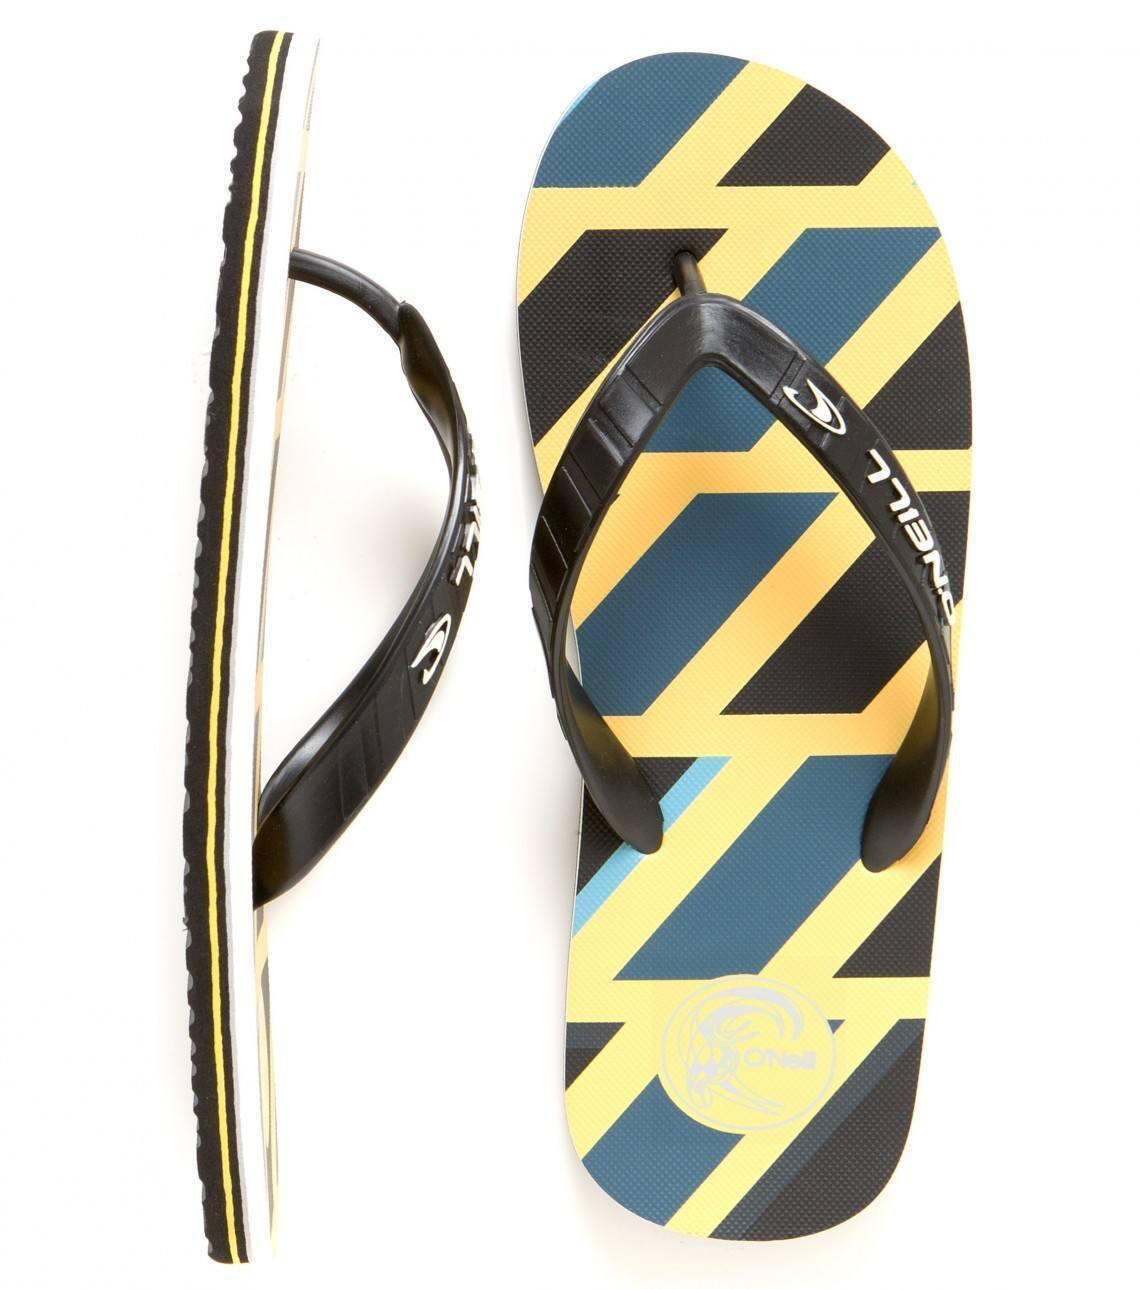 Gentlemen/Ladies O'Neill Profile Sandals (9) Yellow superior name Skilled manufacturing International big name superior 8f98ab